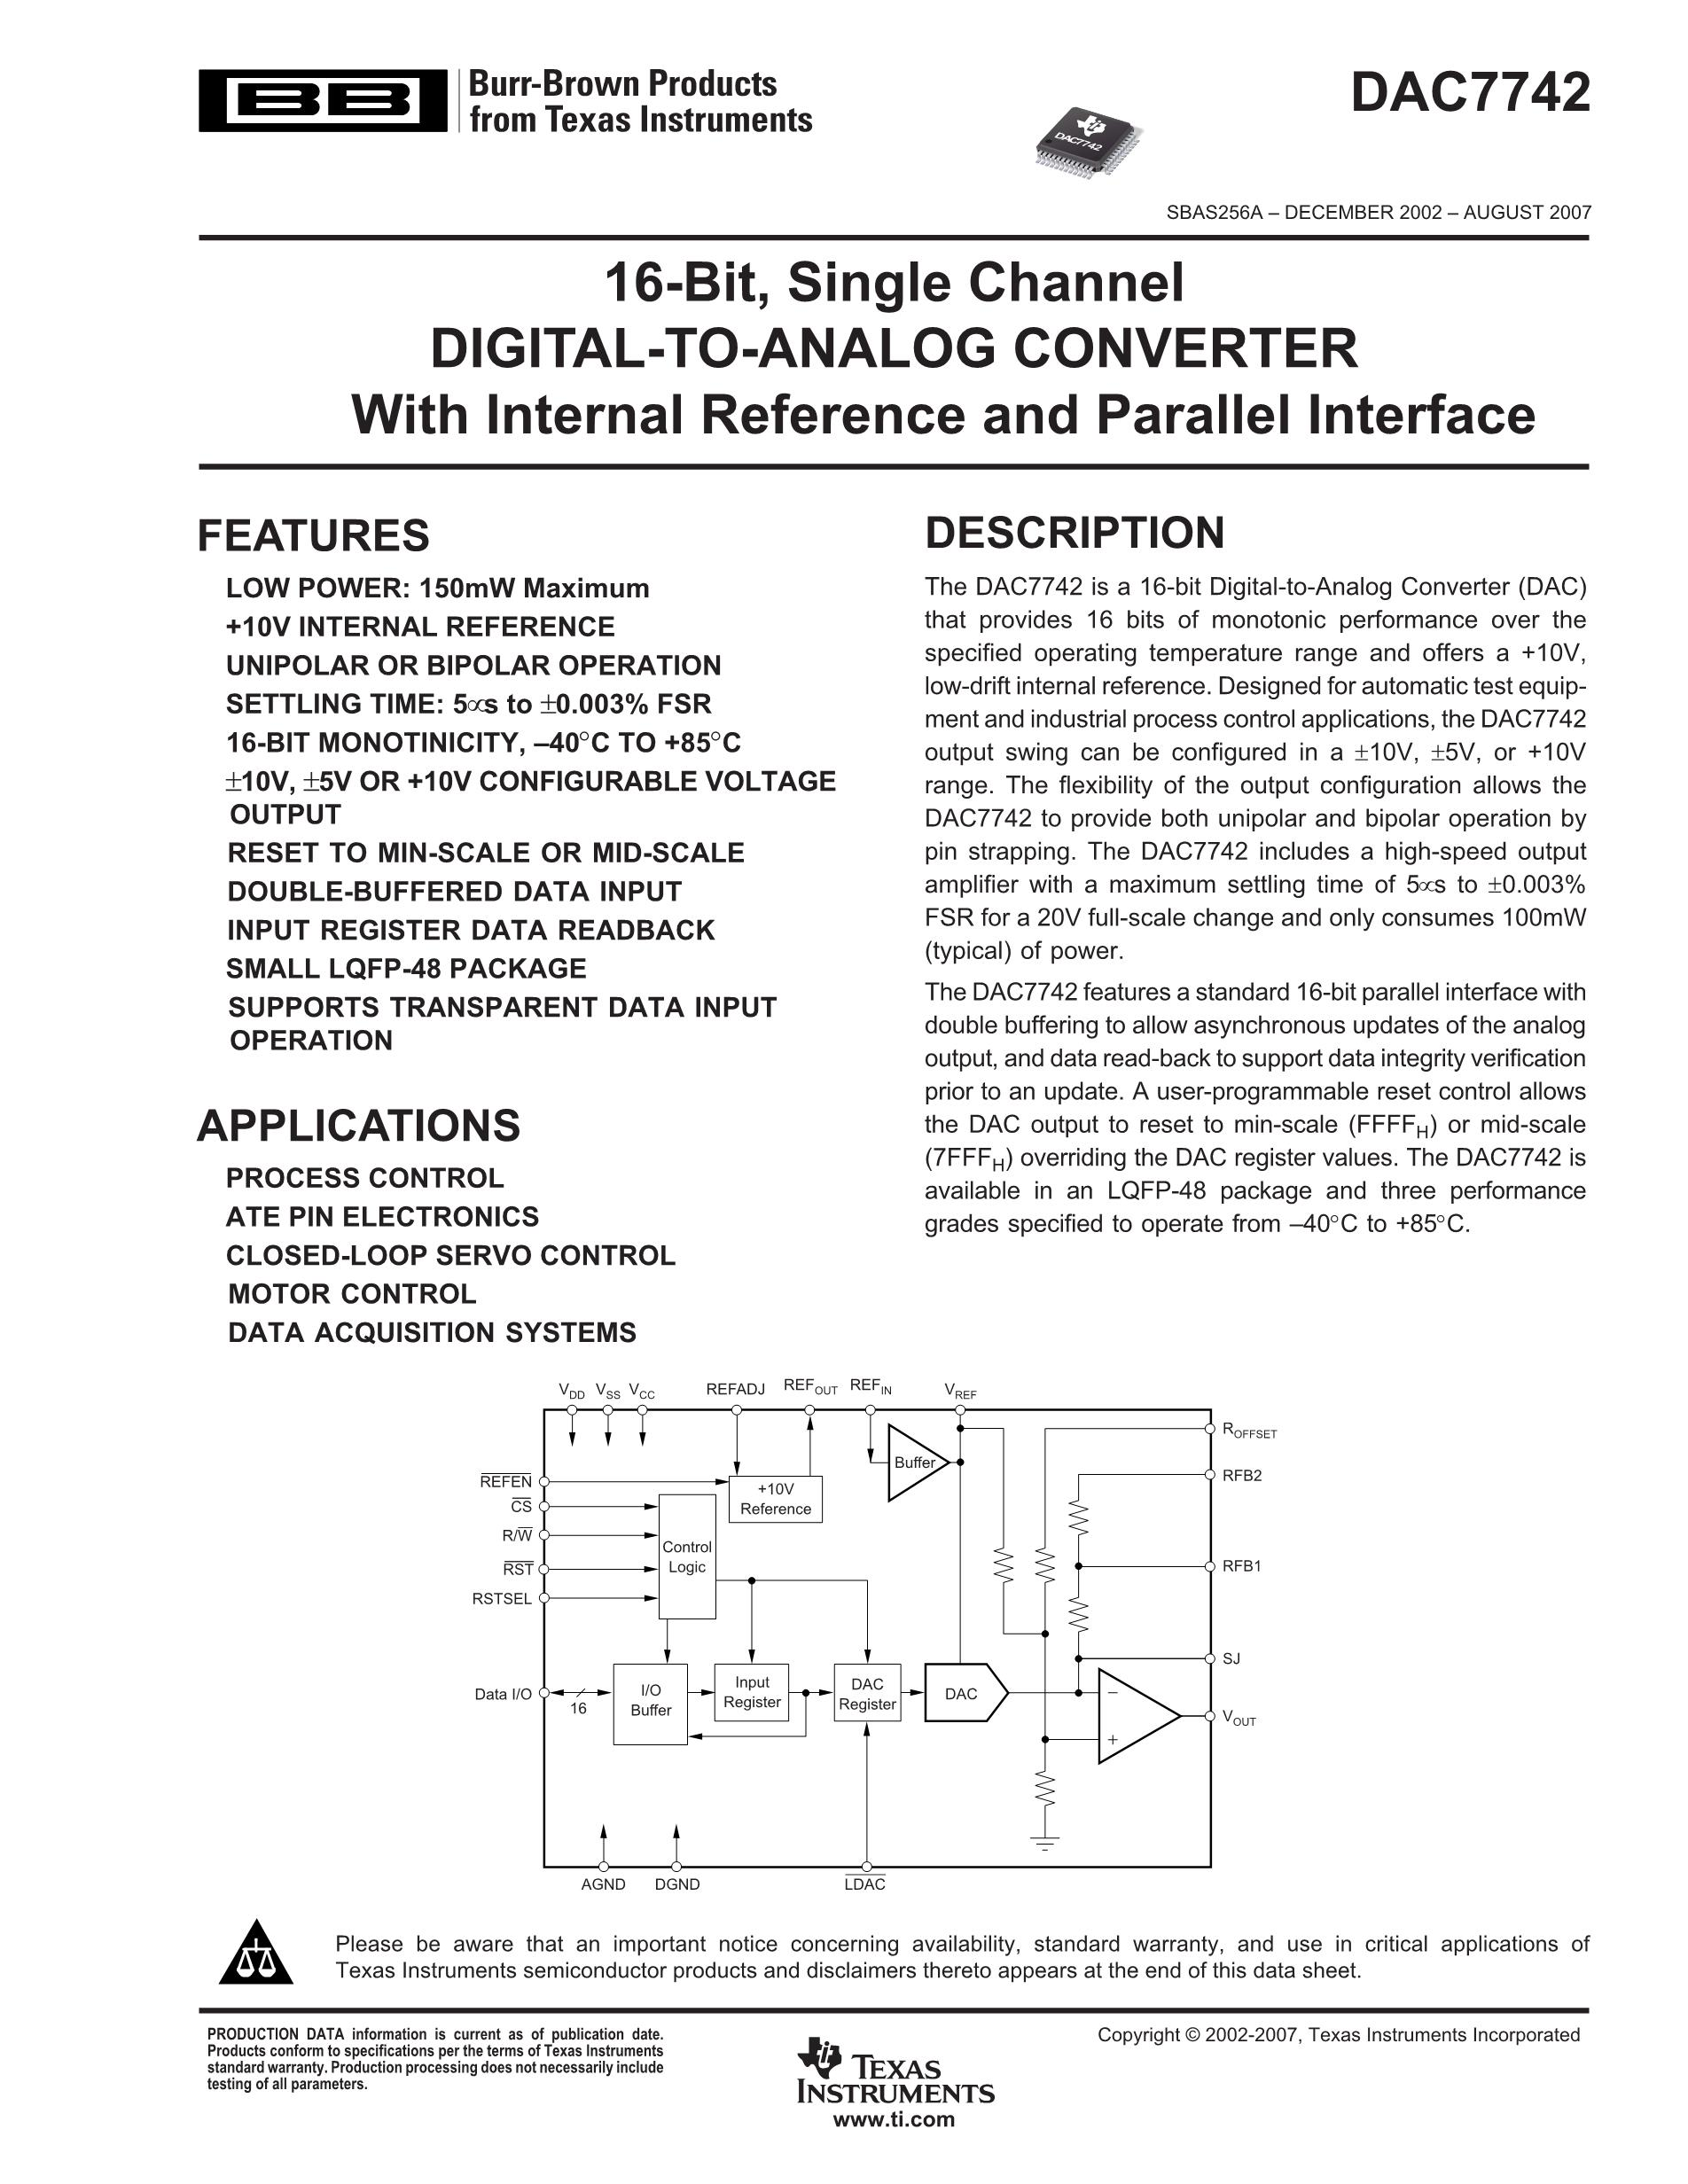 DAC7562TDSCT's pdf picture 1